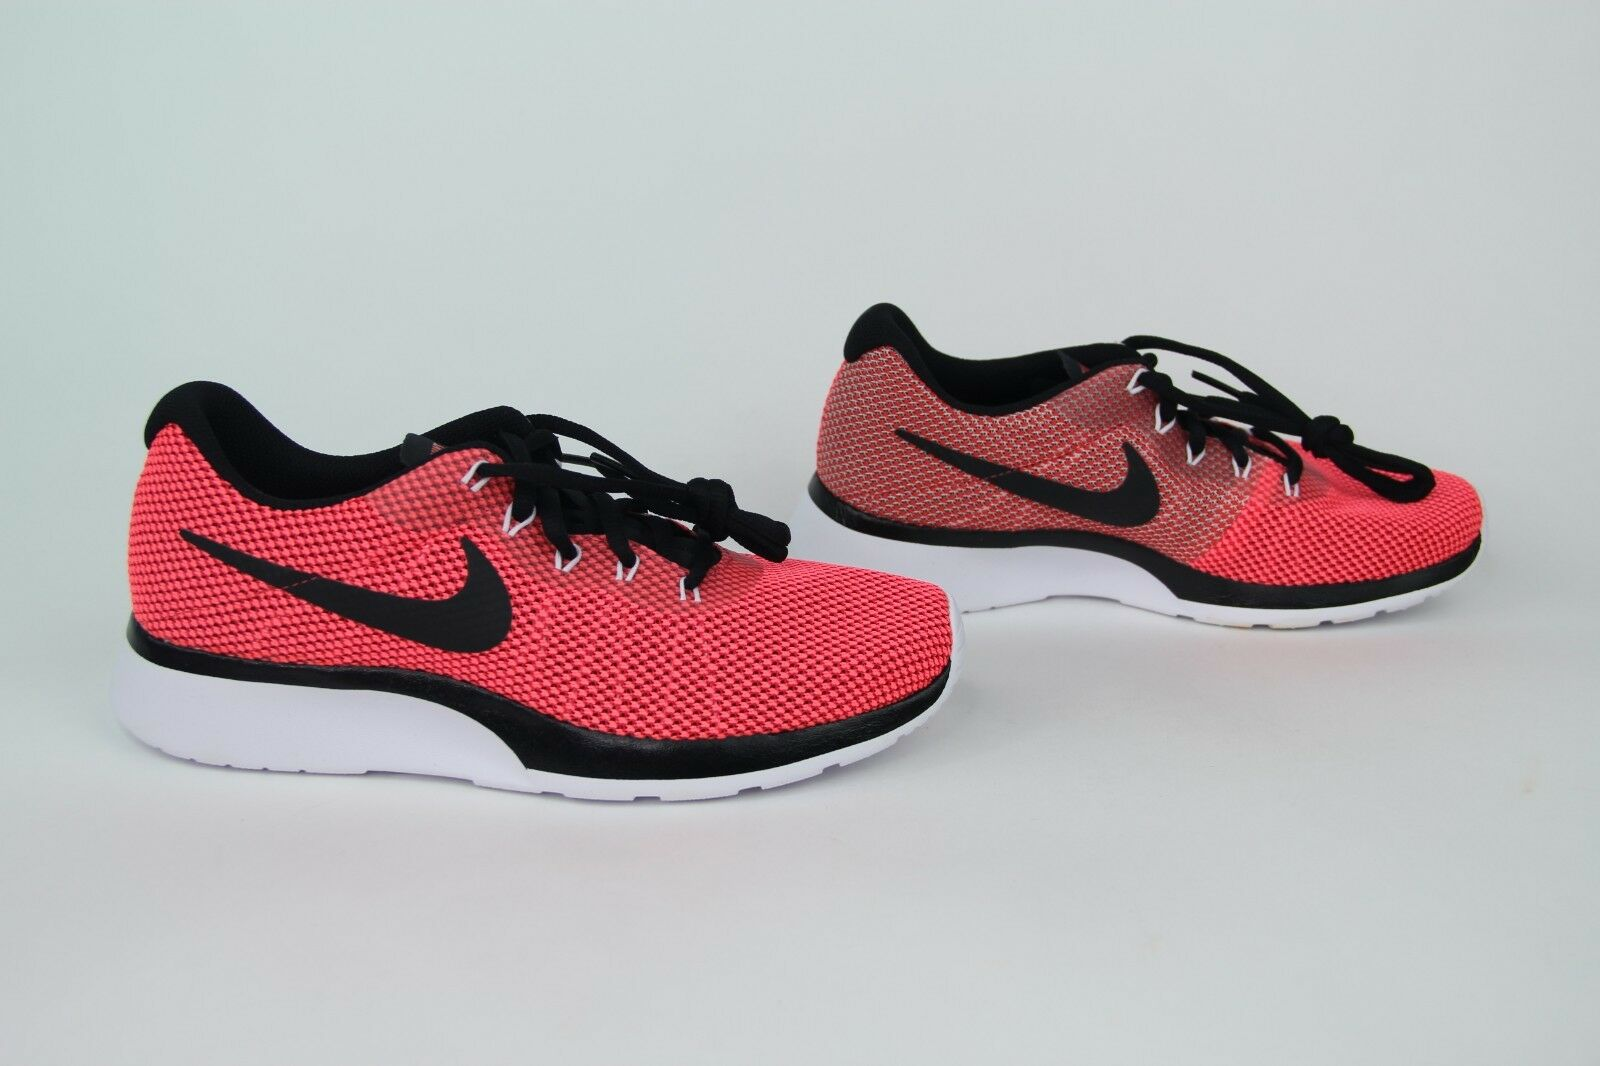 NEW NEW NEW Nike Tanjun Racer shoes Tropical Pink Black 921668-601 Women's Sz 7.5 700fda